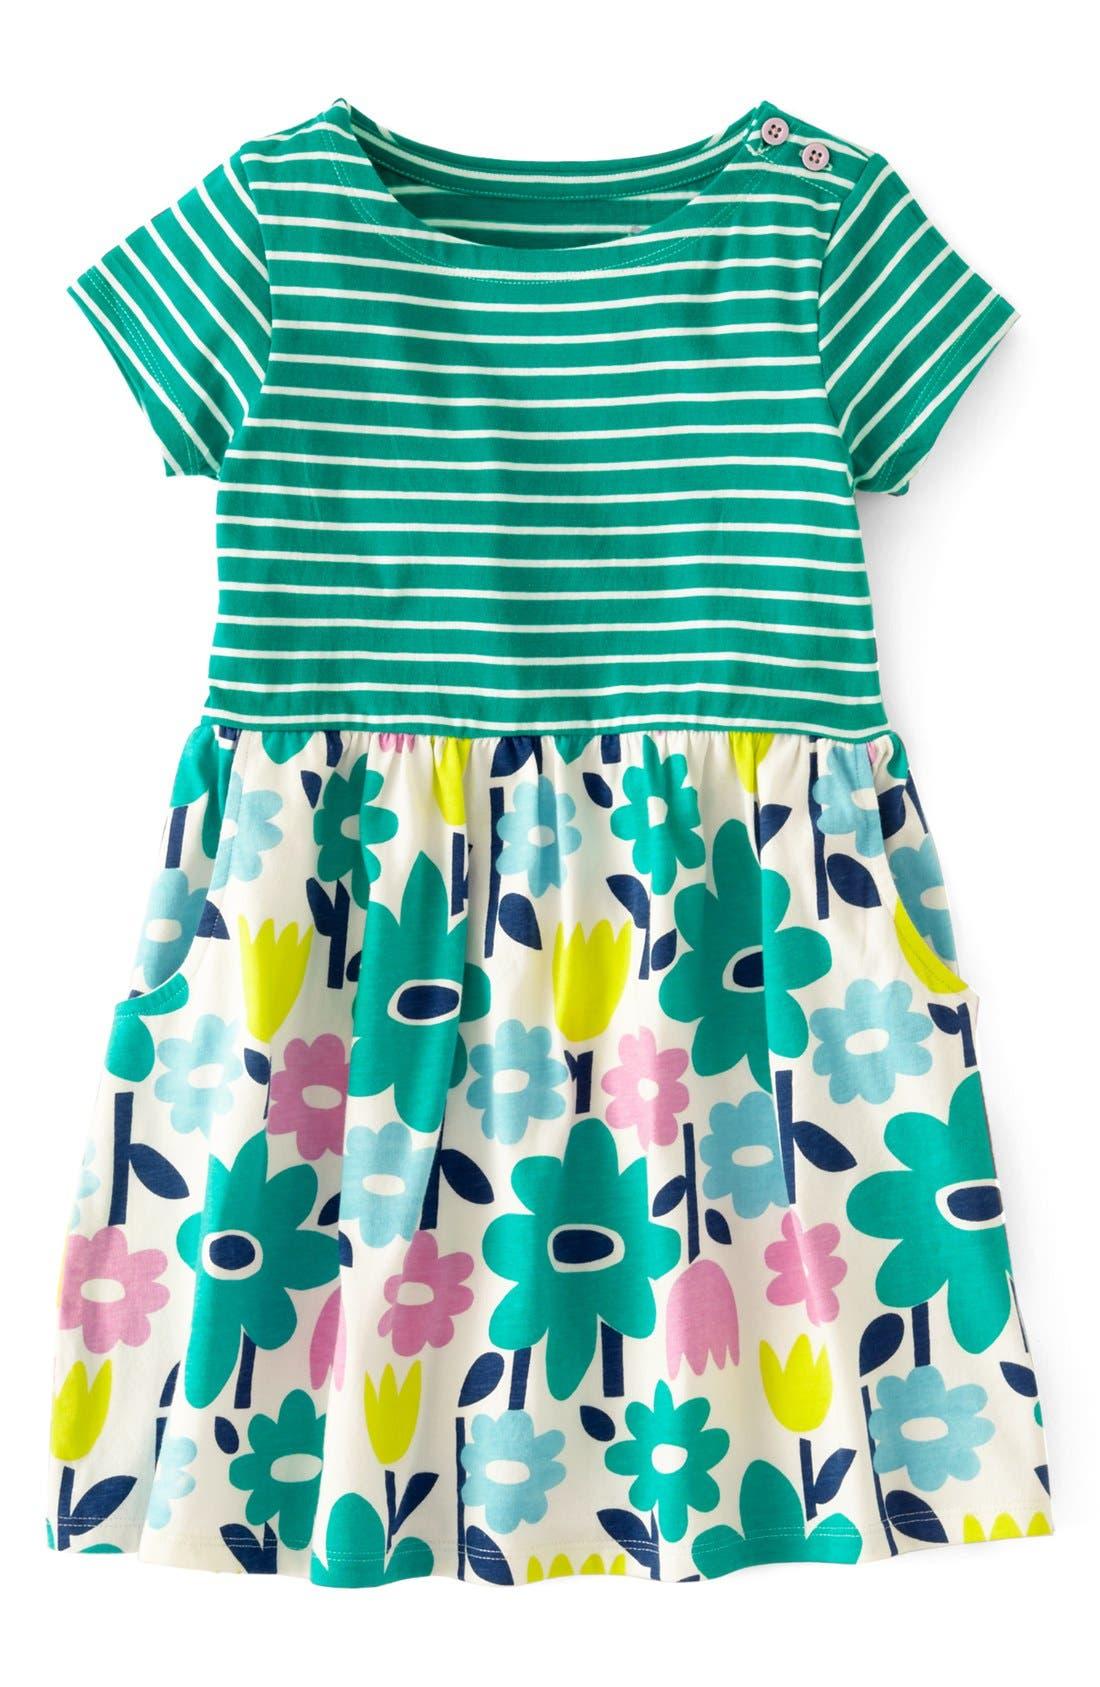 MINI BODEN 'Hotchpotch' Jersey Dress, Main, color, 304